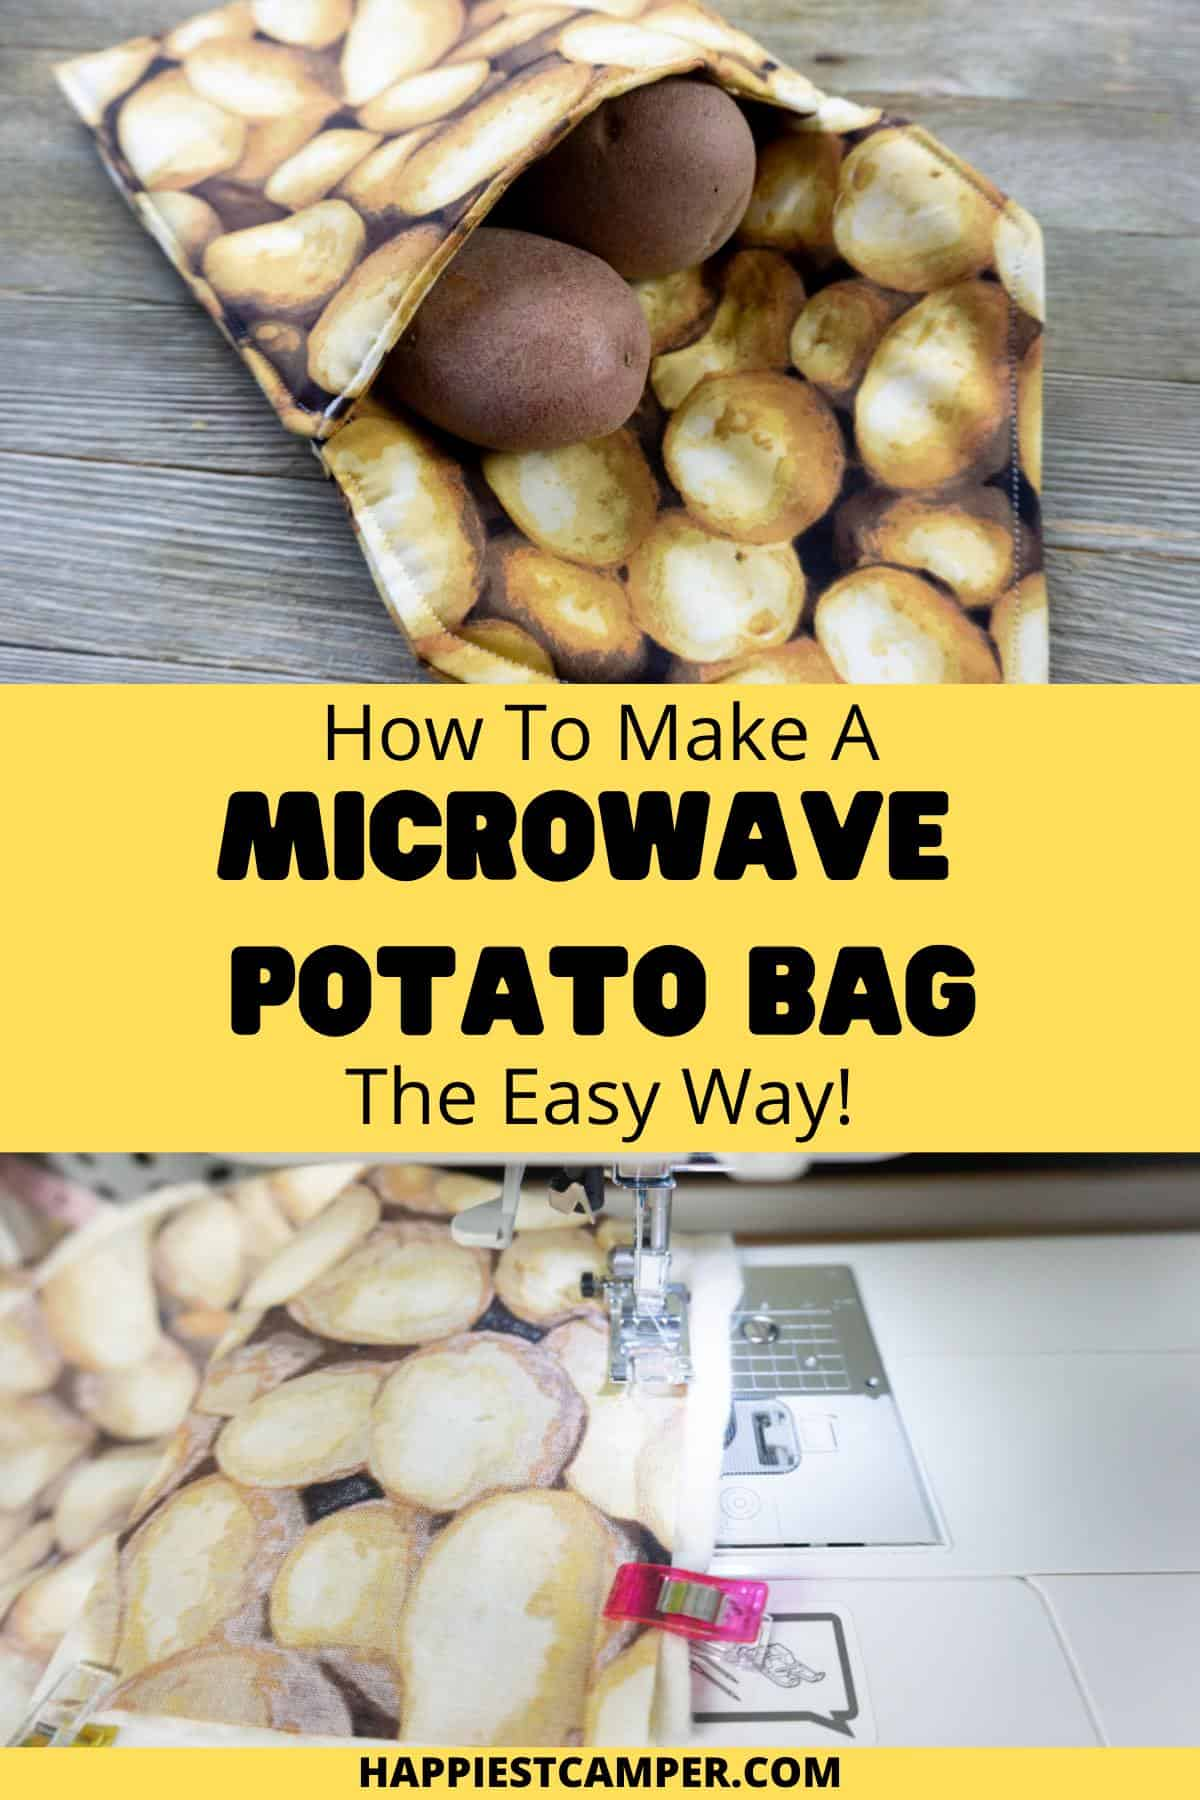 How To Make A Microwave Potato Bag The Easy Way